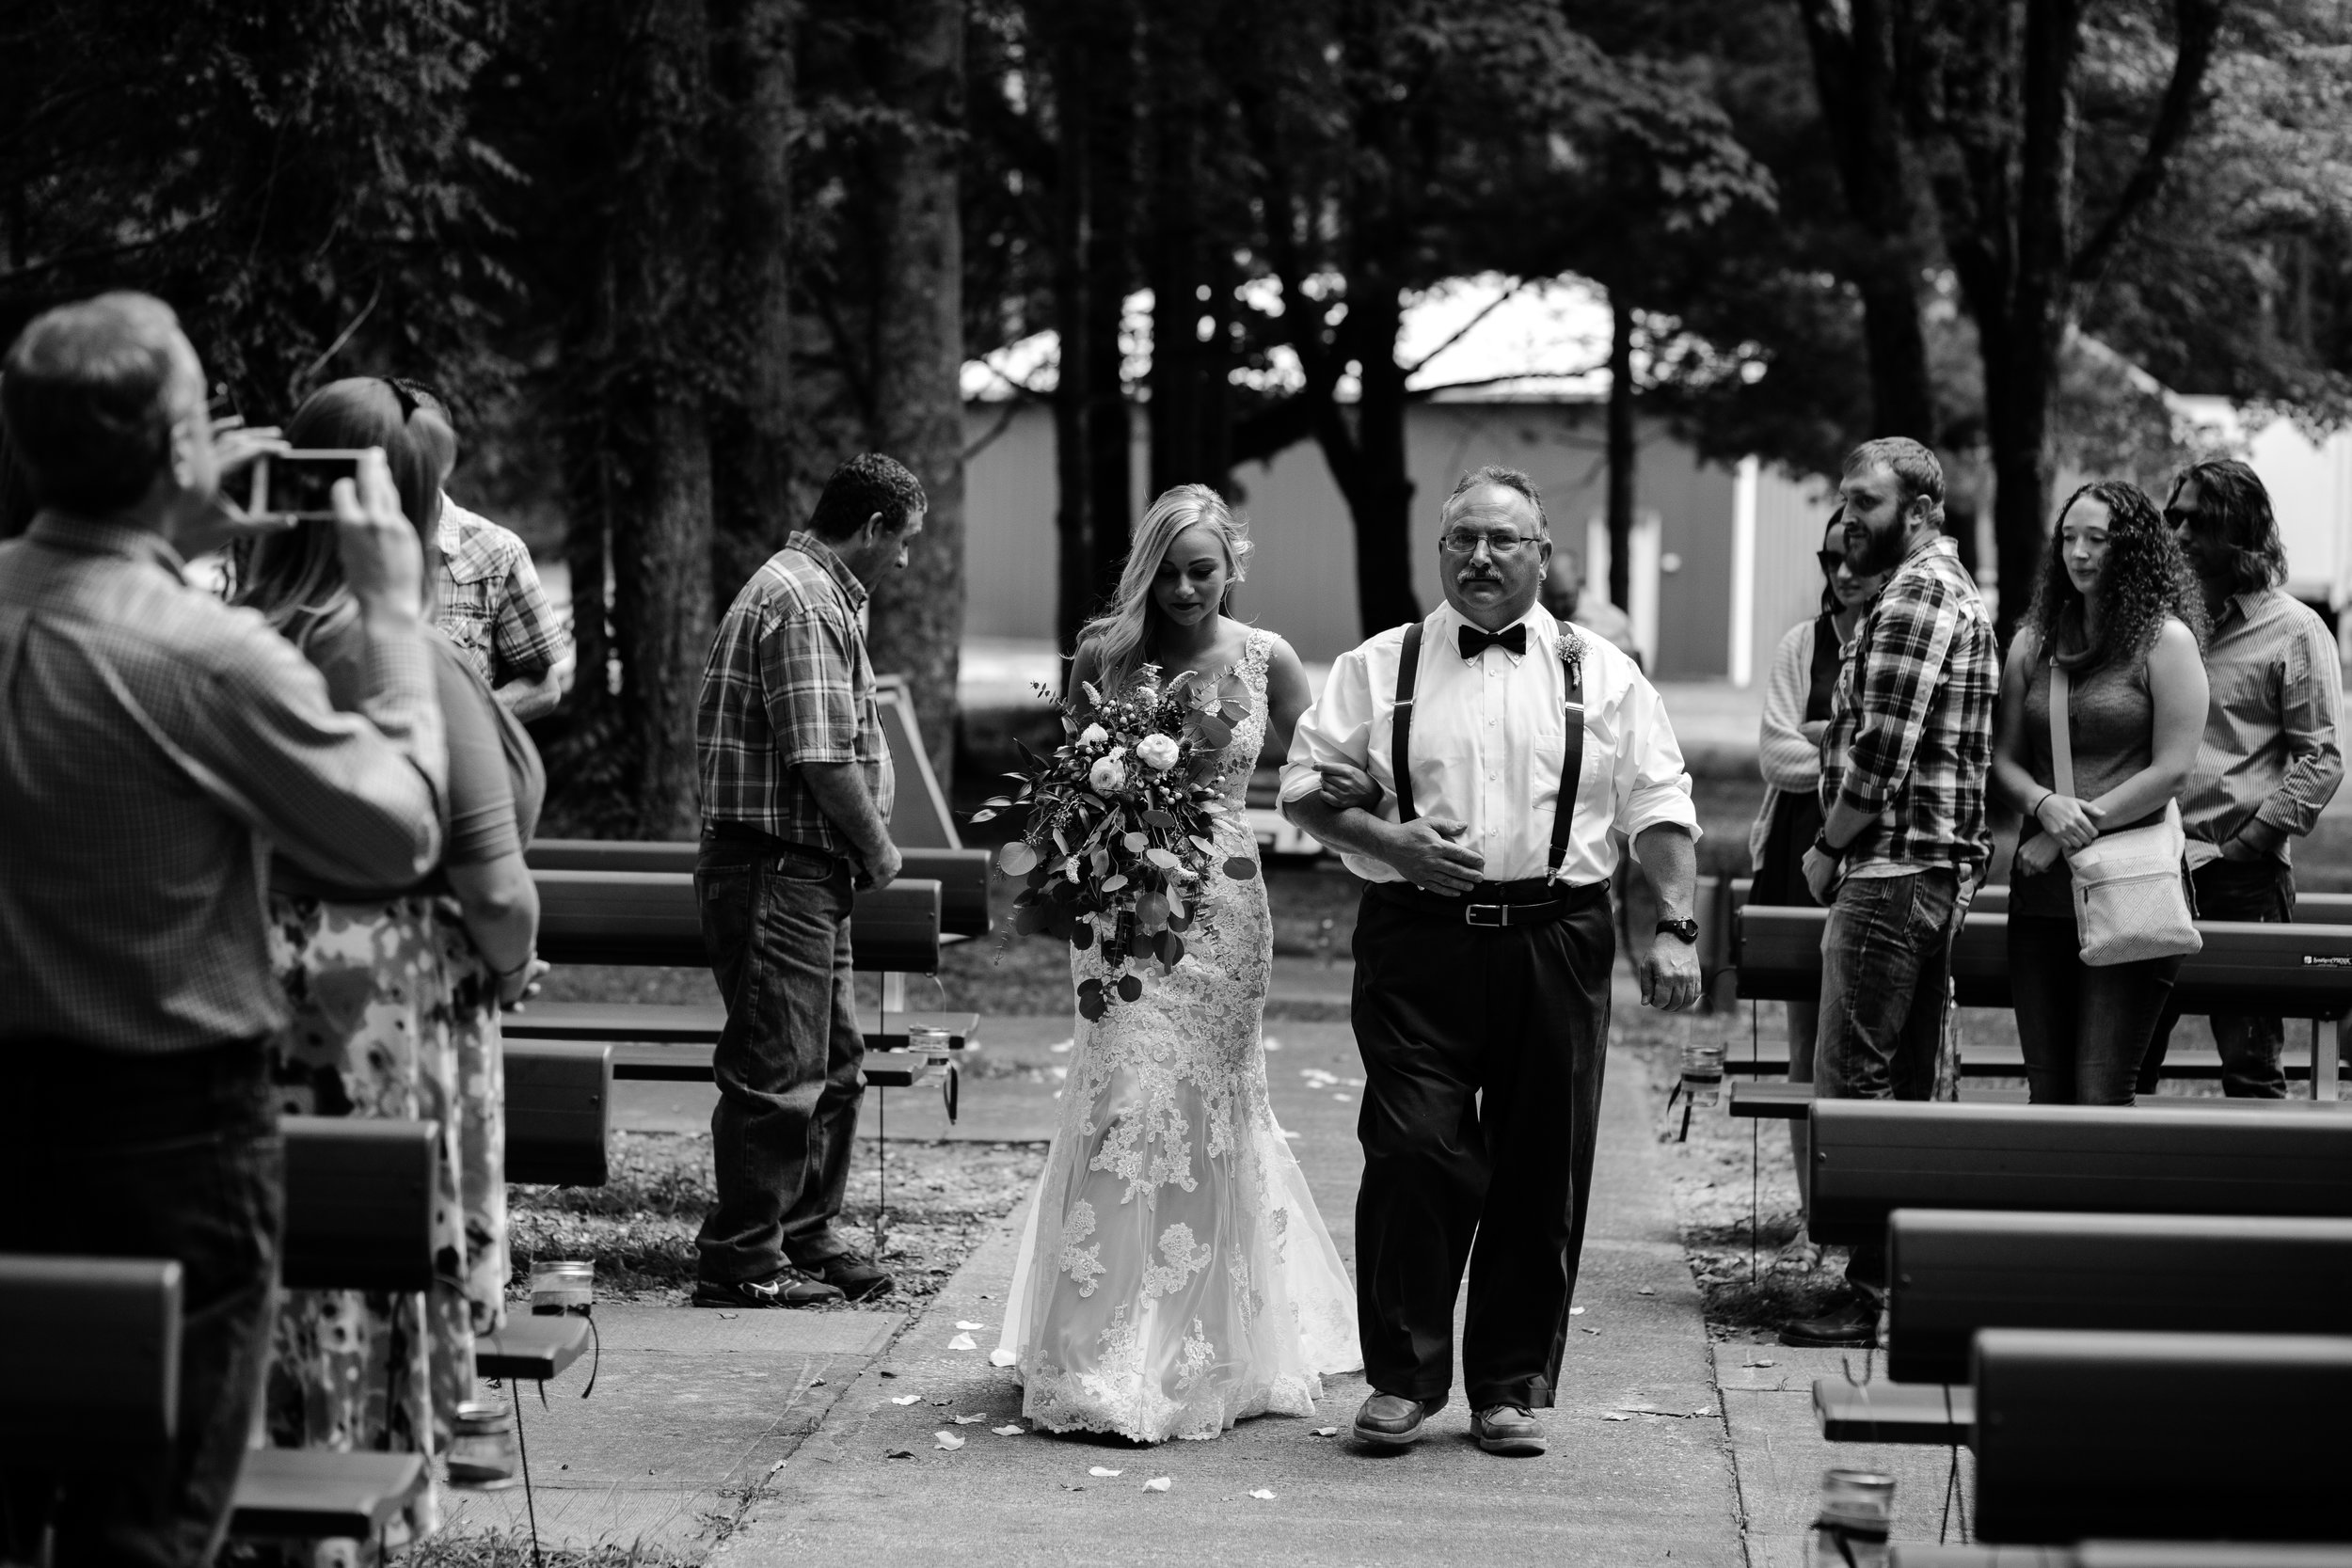 west-michigan-wedding-photographer-whitehall-rachel-austin-chapel-in-the-pines-250.jpg